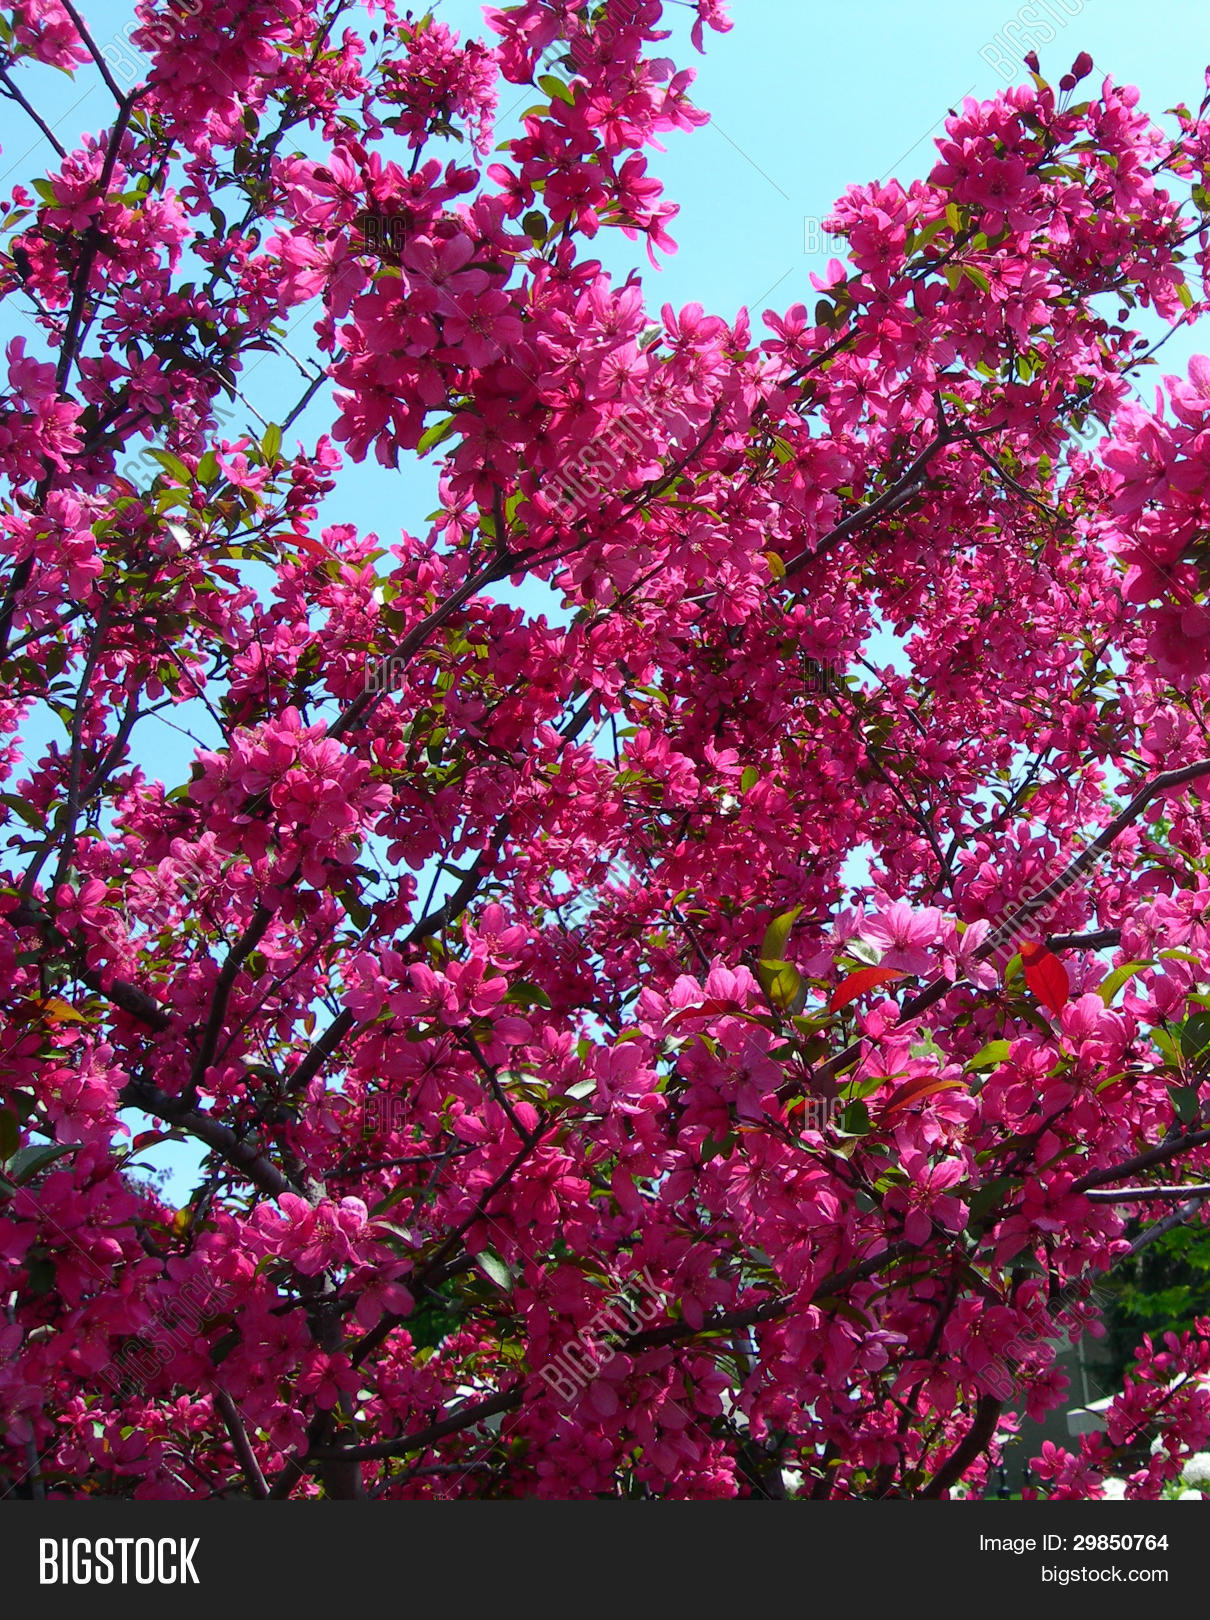 Hot Pink Flowering Image Photo Free Trial Bigstock